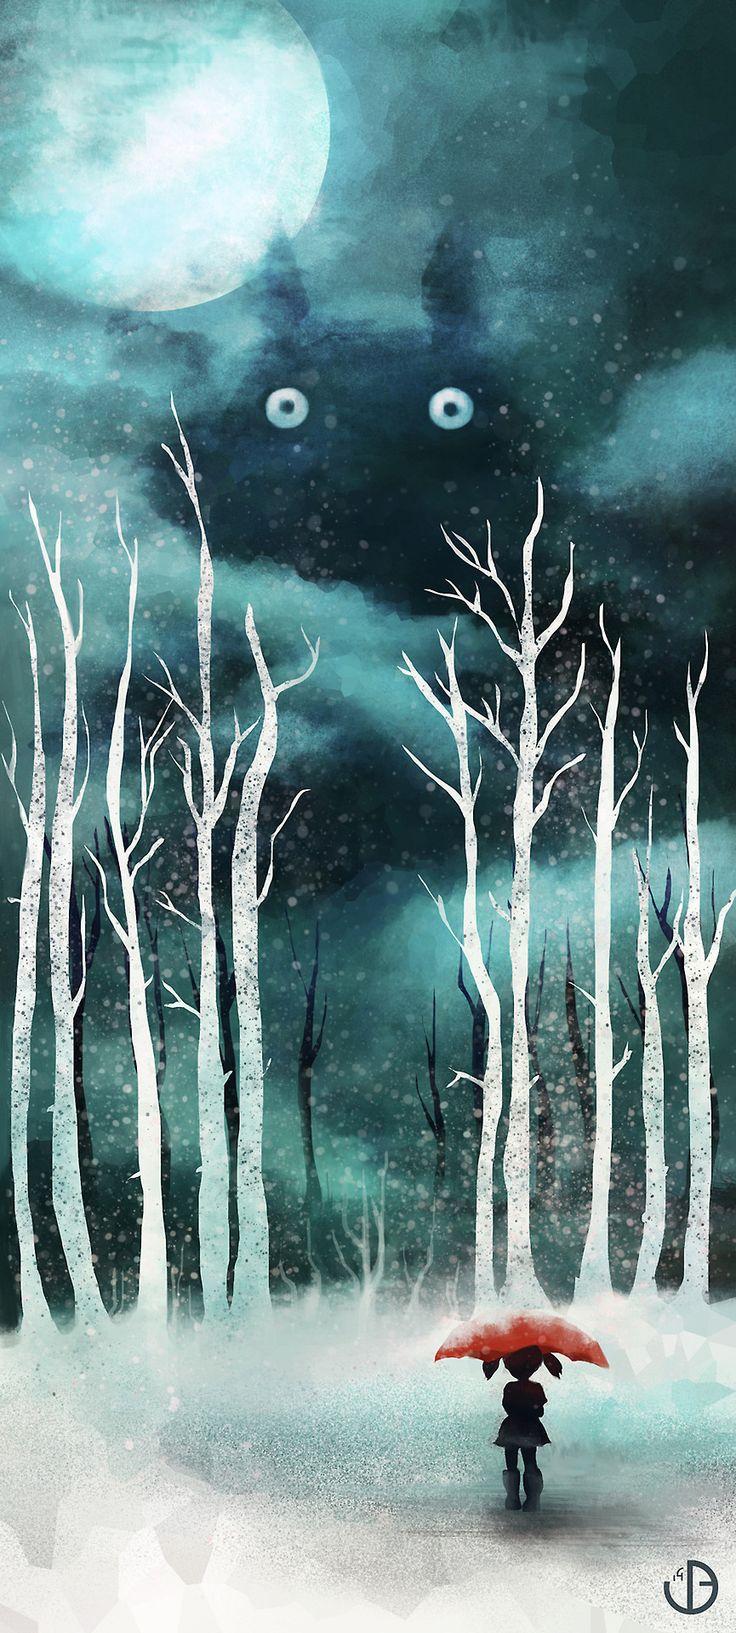 The Art Of Animation, Vincent belbari